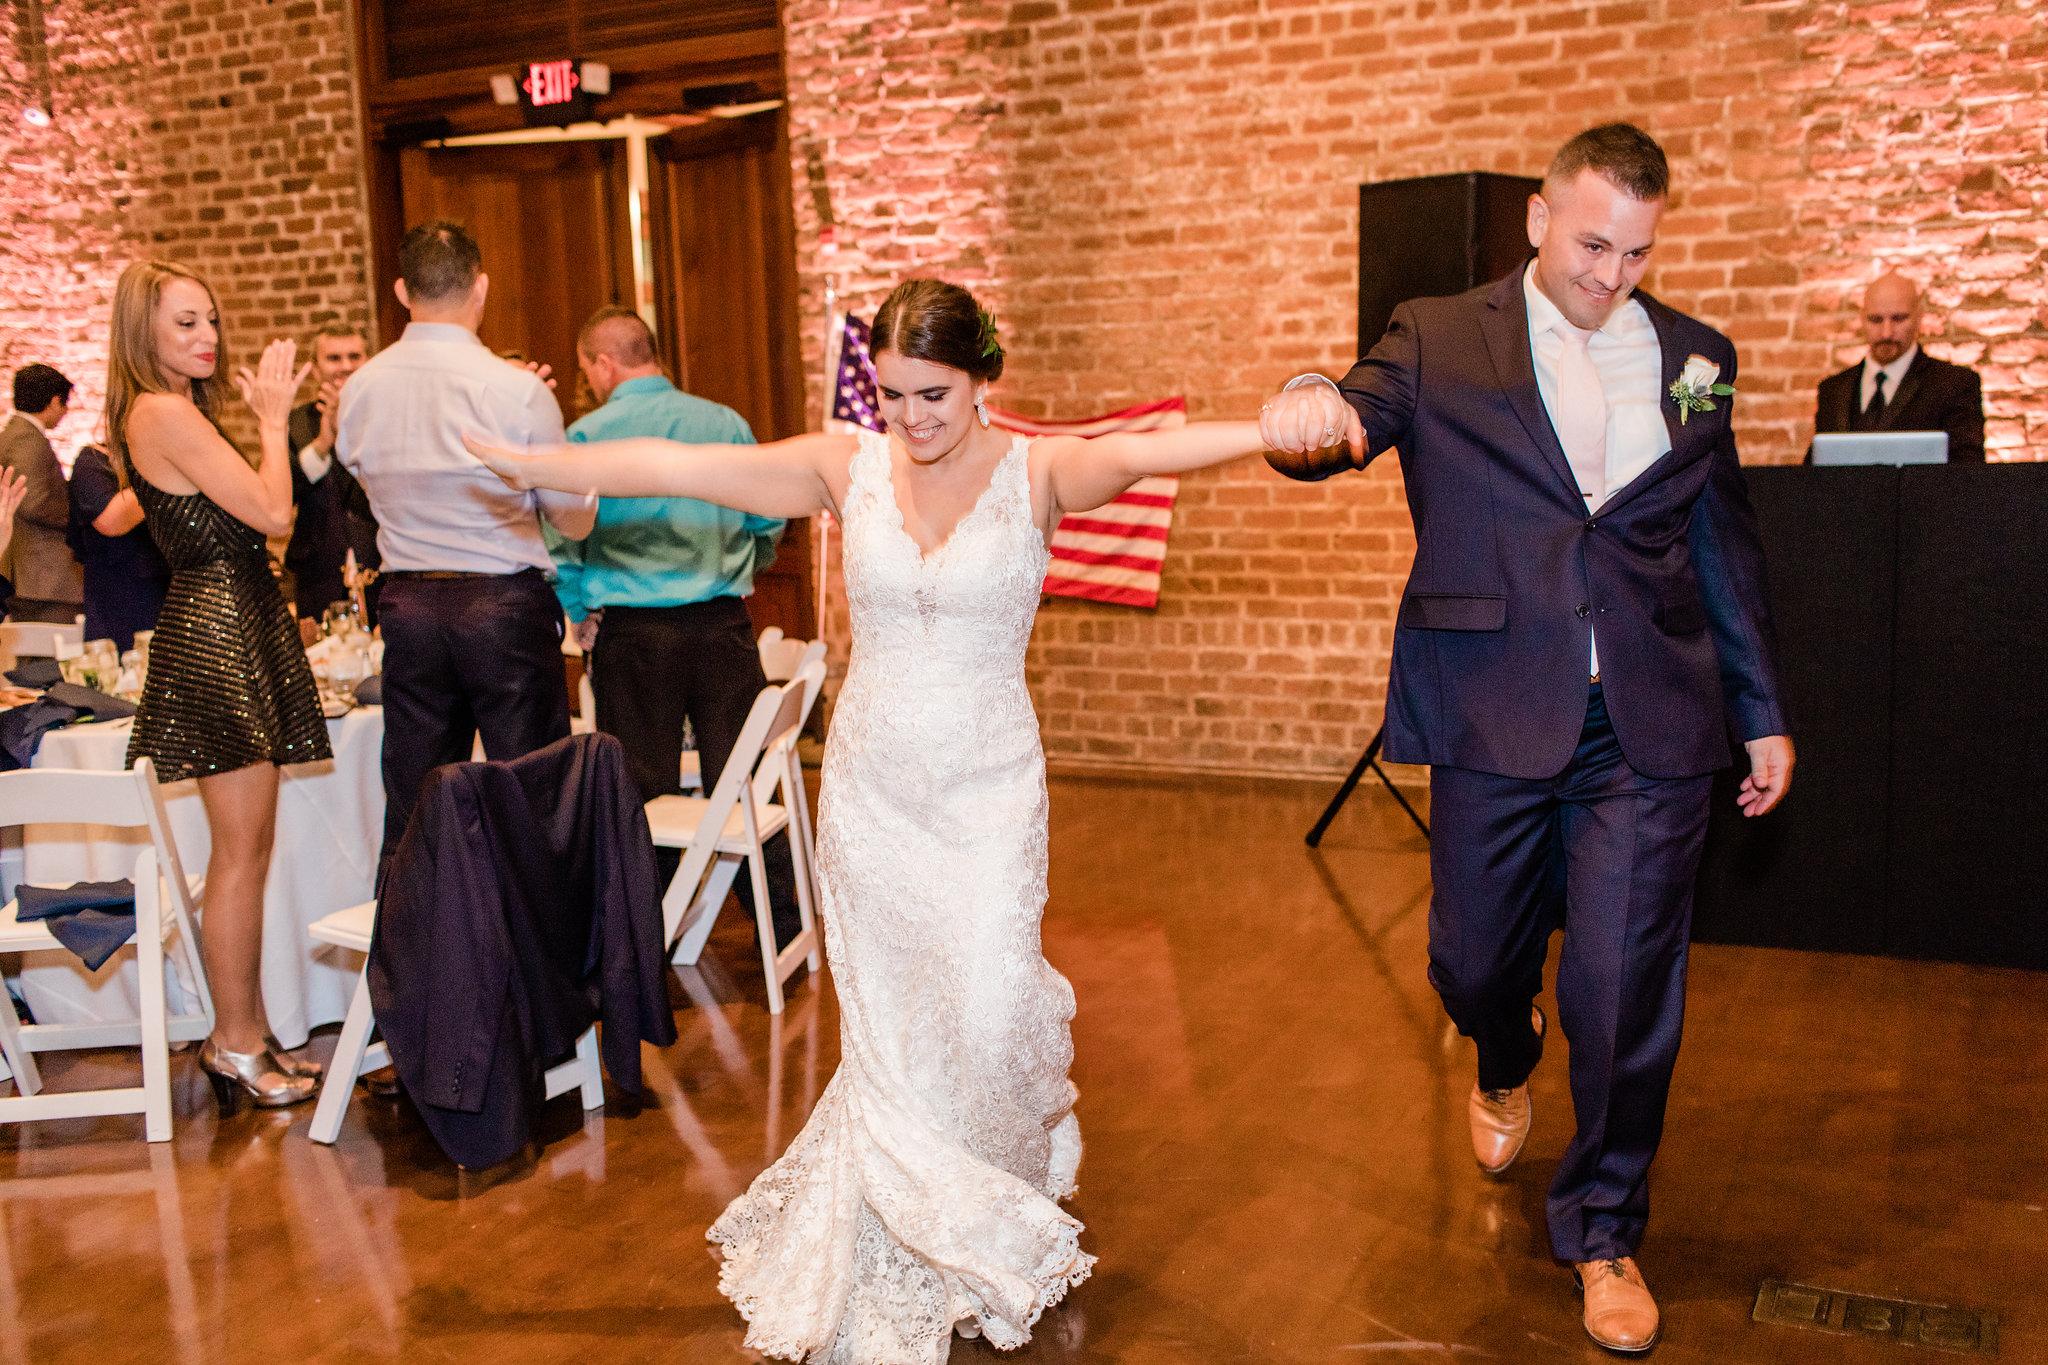 apt-b-photography-Savannah-wedding-photographer-savannah-engagement-photographer-historic-savannah-engagement-charles-h-morris-center-wedding-savannah-weddings-45.JPG